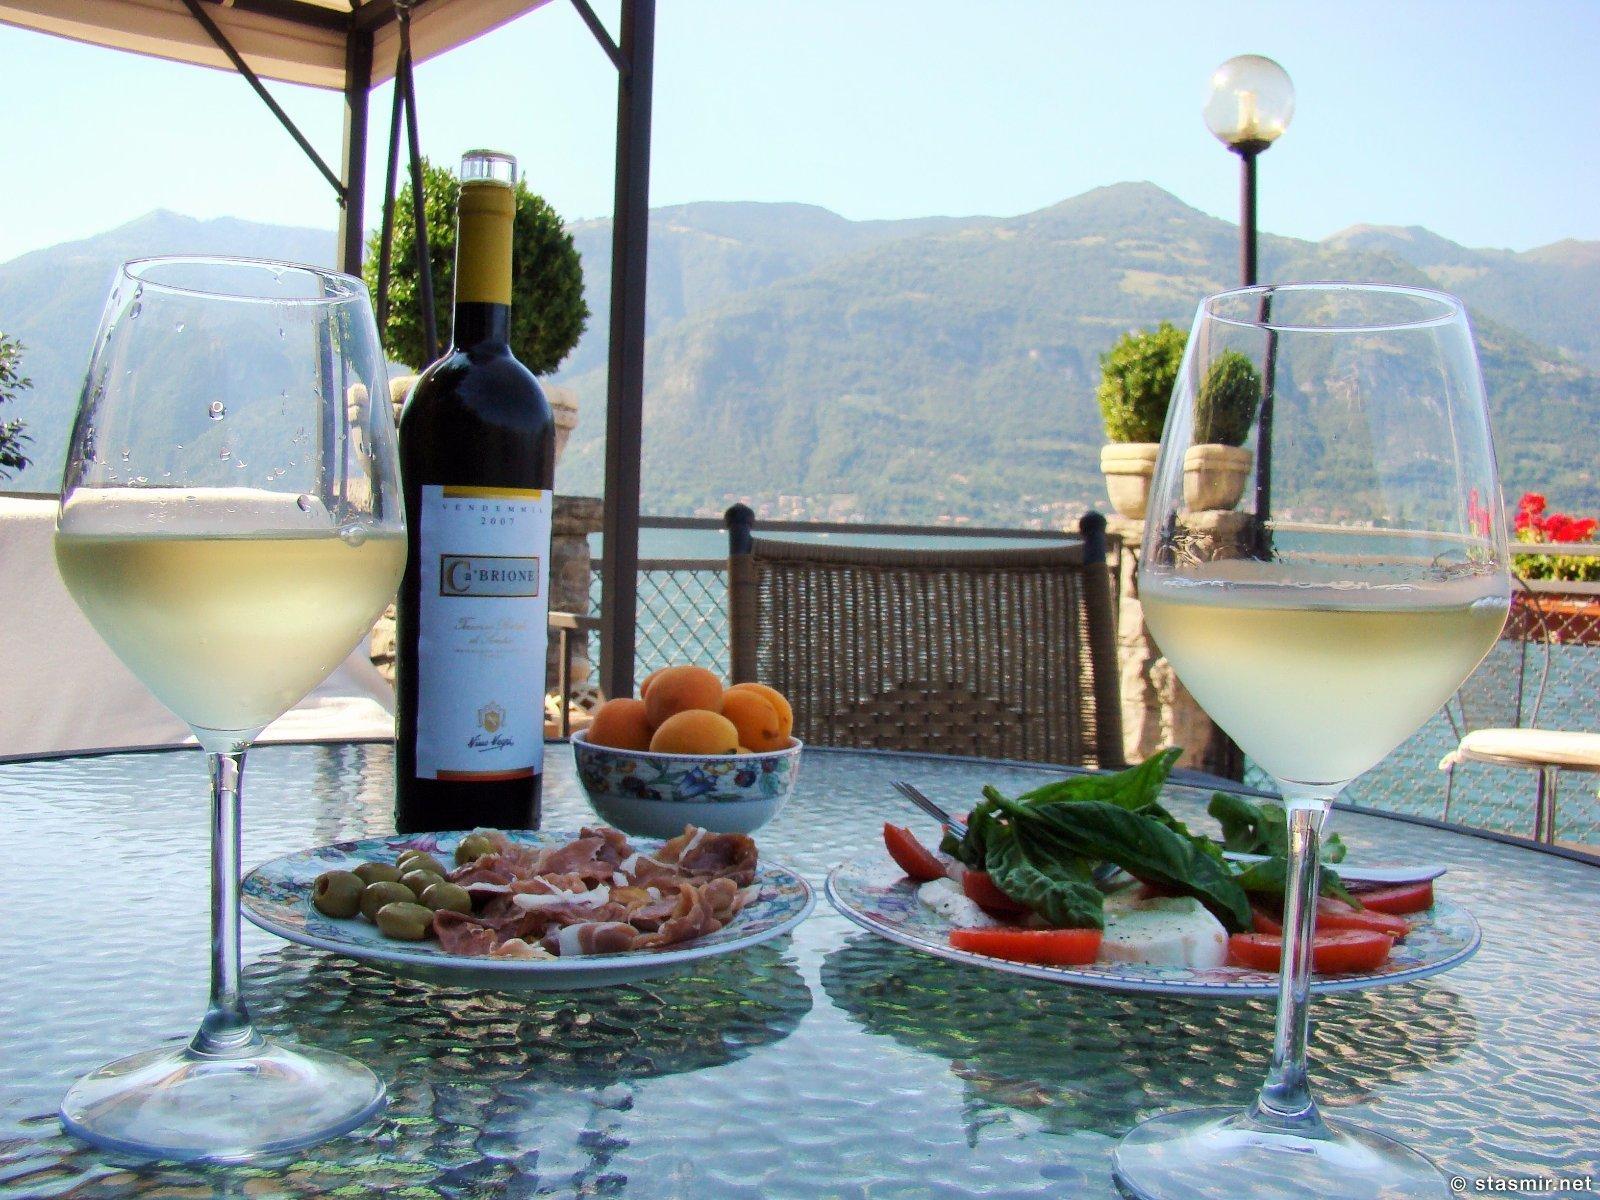 Завтрак Президента: озеро Комо, Лаго ди Комо, Северная Италия, фото Стасмир, Photo Stasmir